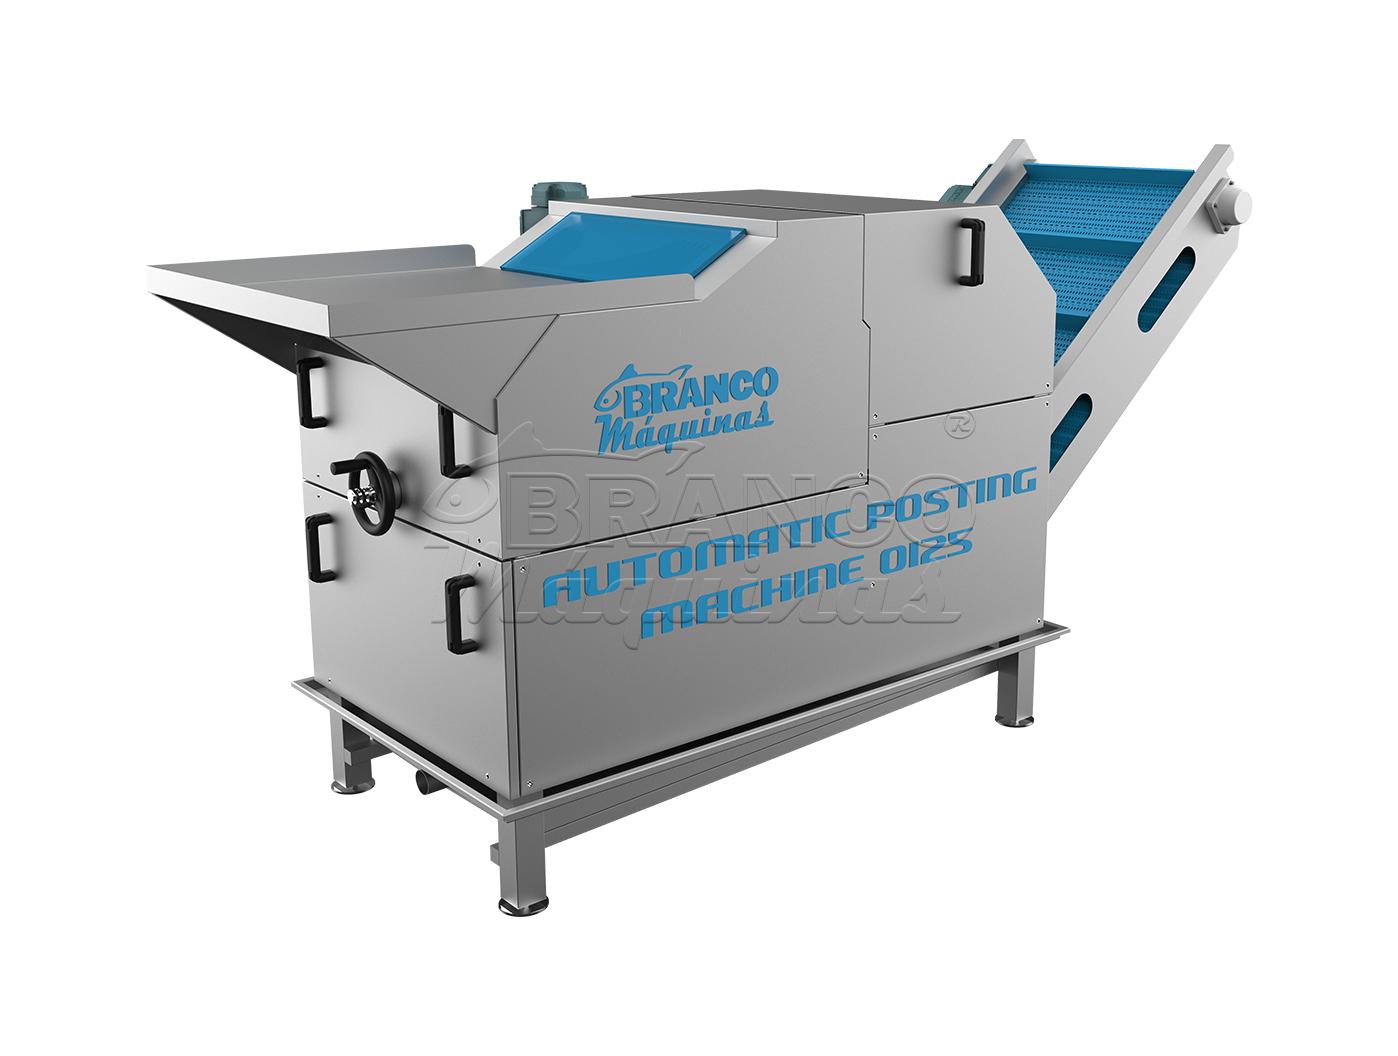 Automatic Posting Machine 0125